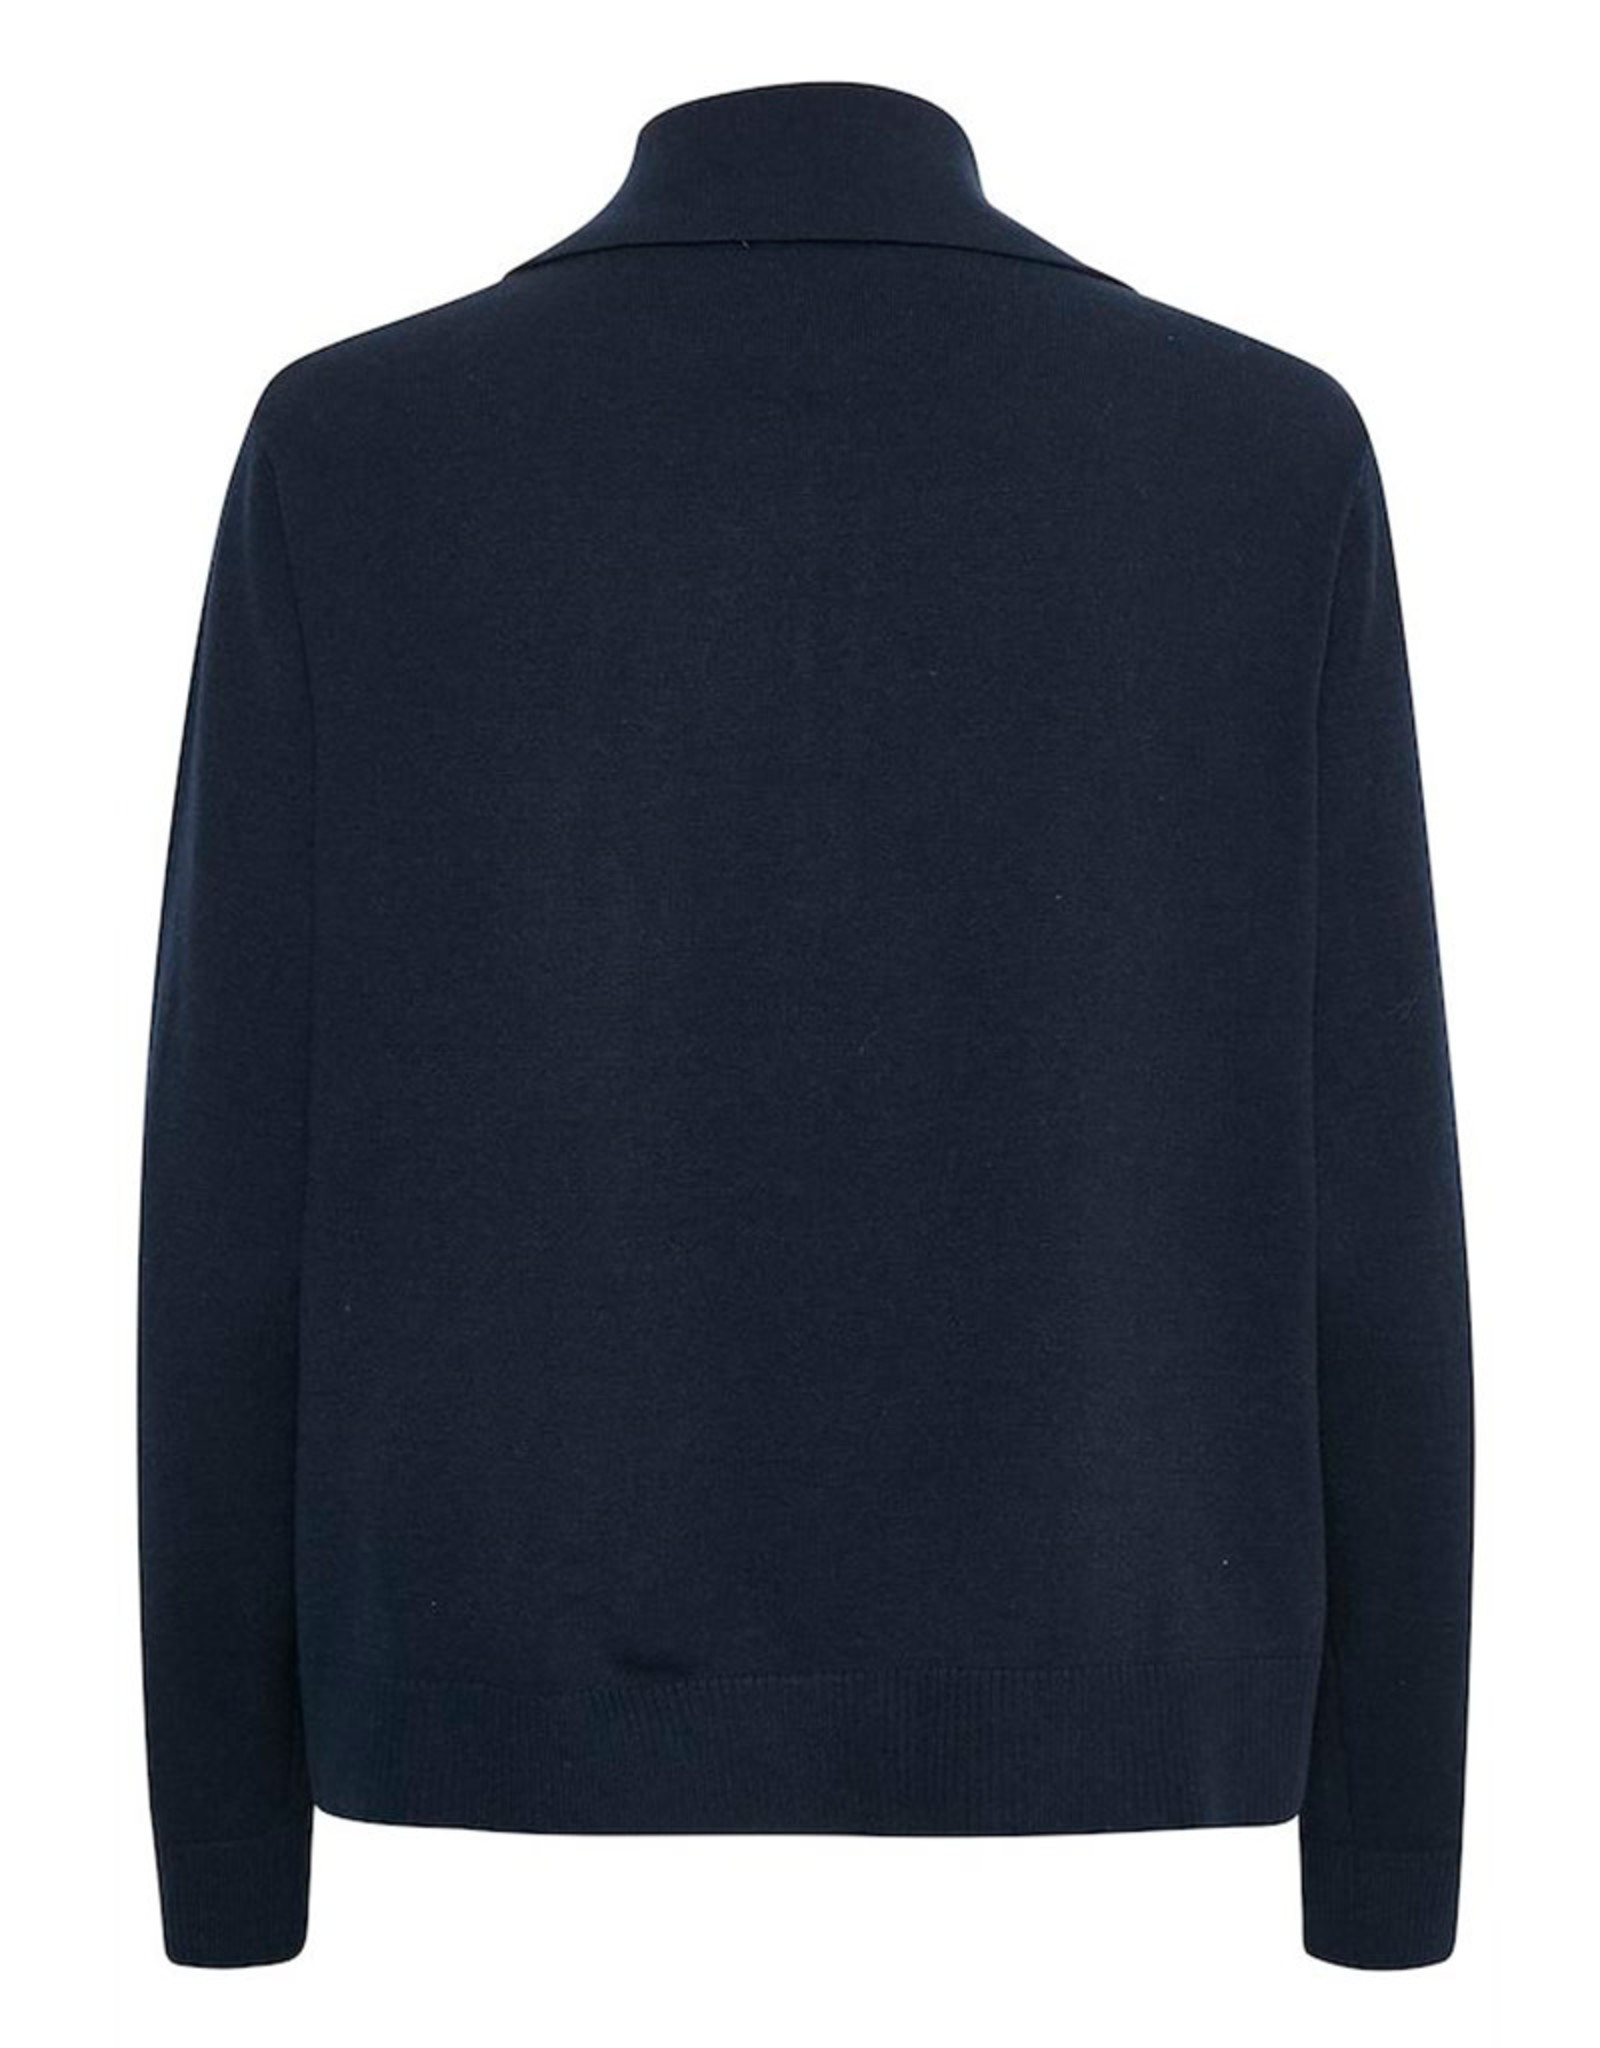 My Essential Wardrobe June Collar Pullover